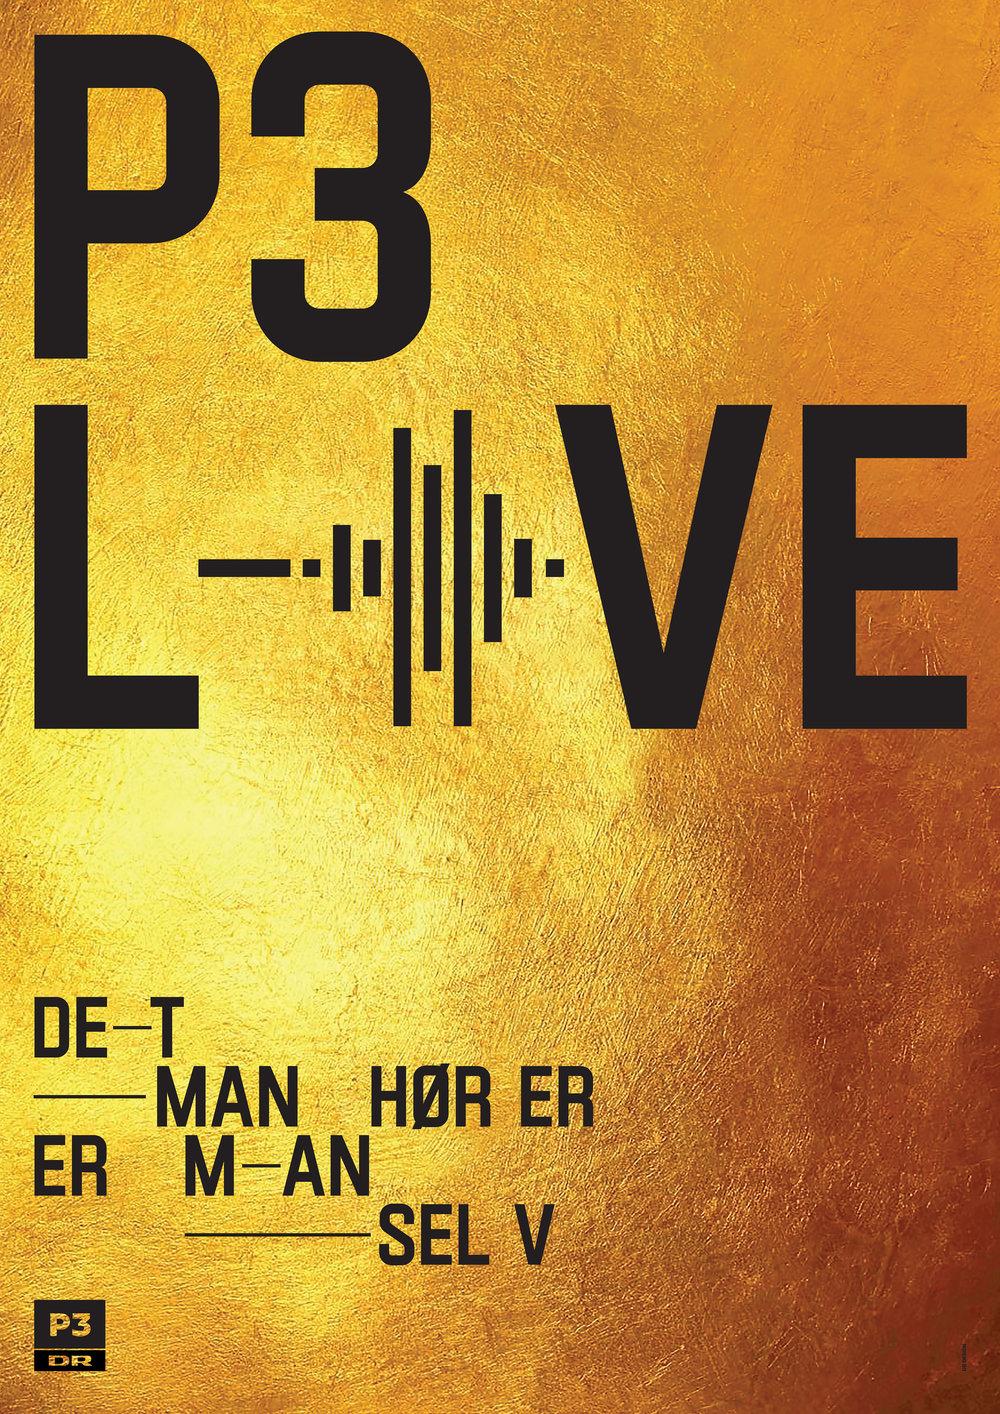 2019_DRP3_LIVE_poster594x840_RT1-1.jpg